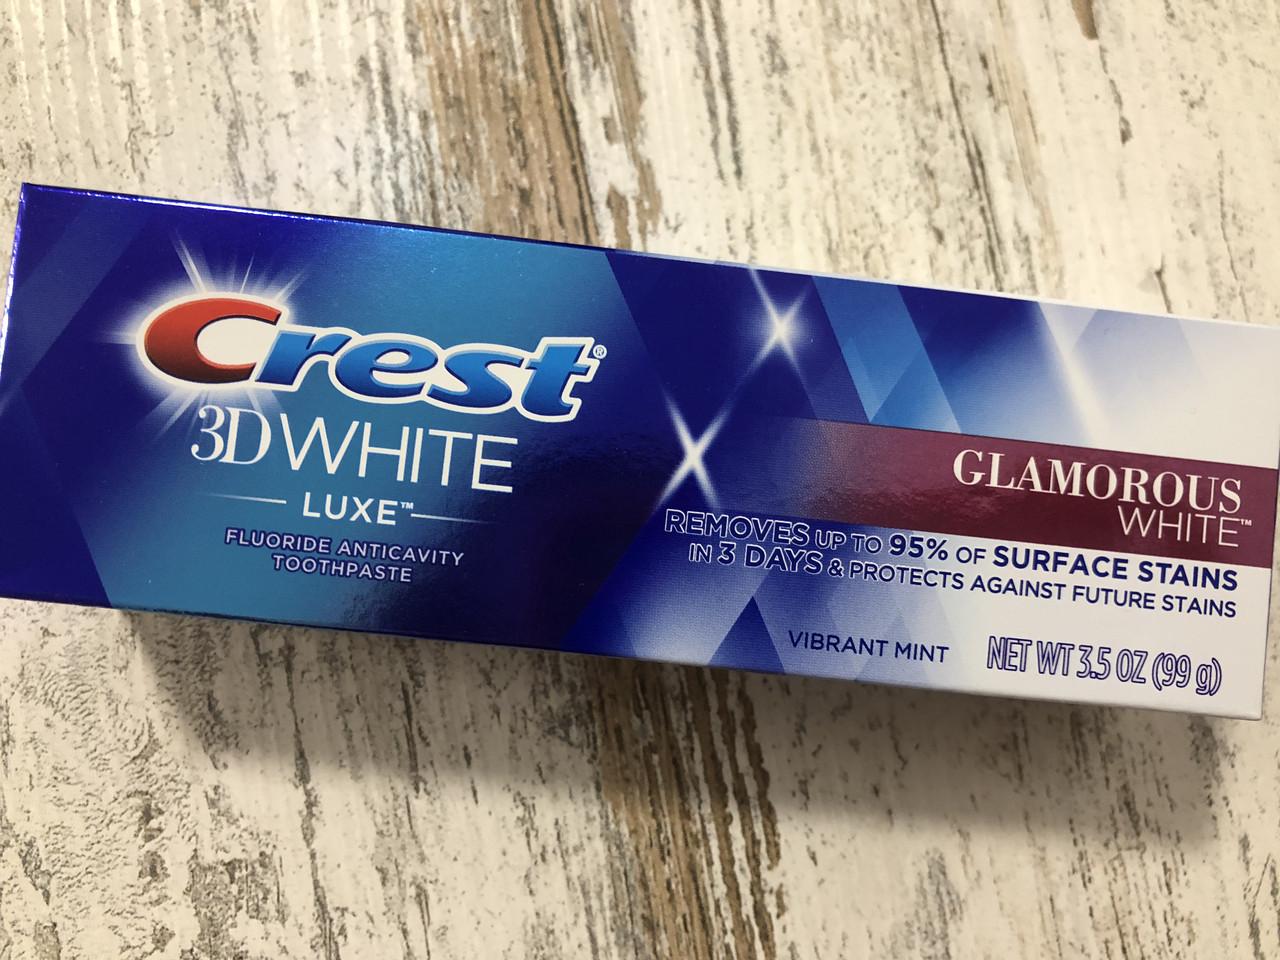 Отбеливание зубов класса люкс Crest 3D White Glamorous, 99 грамм